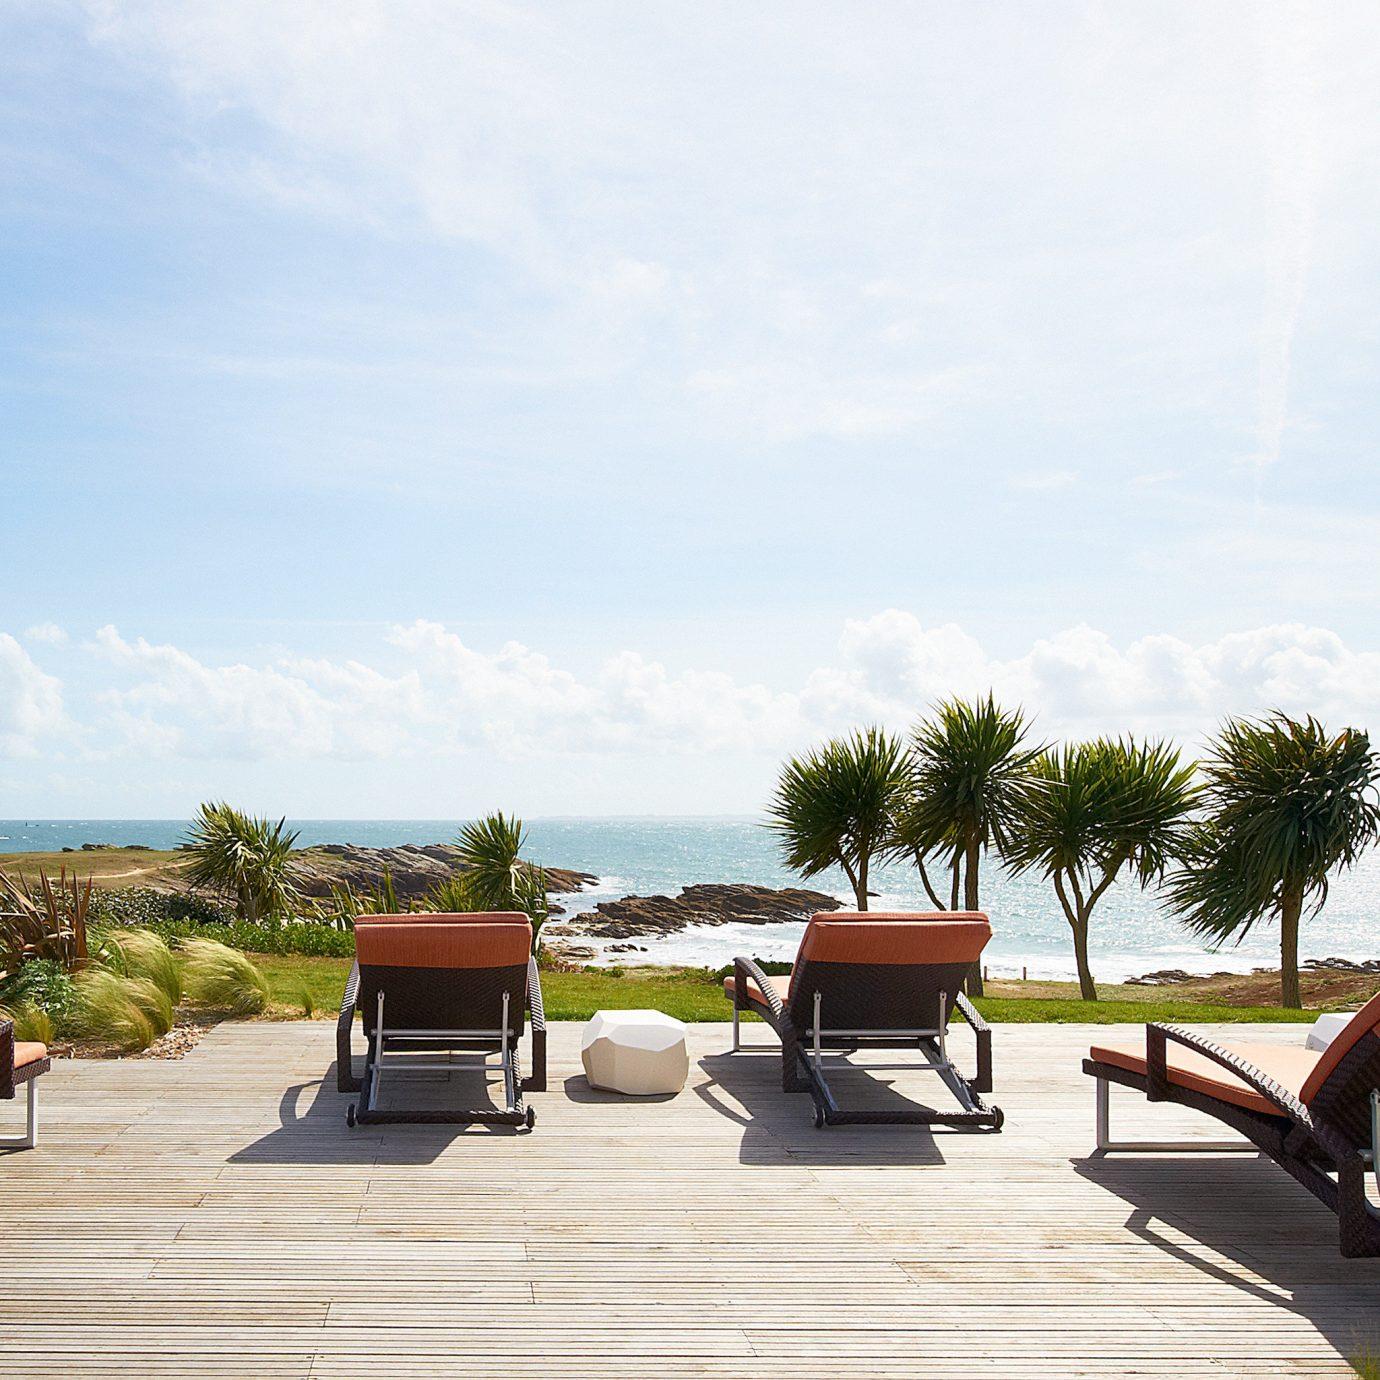 Beachfront Lounge Outdoors Patio Resort Scenic views sky ground property Beach walkway vehicle dock Villa Sea sandy